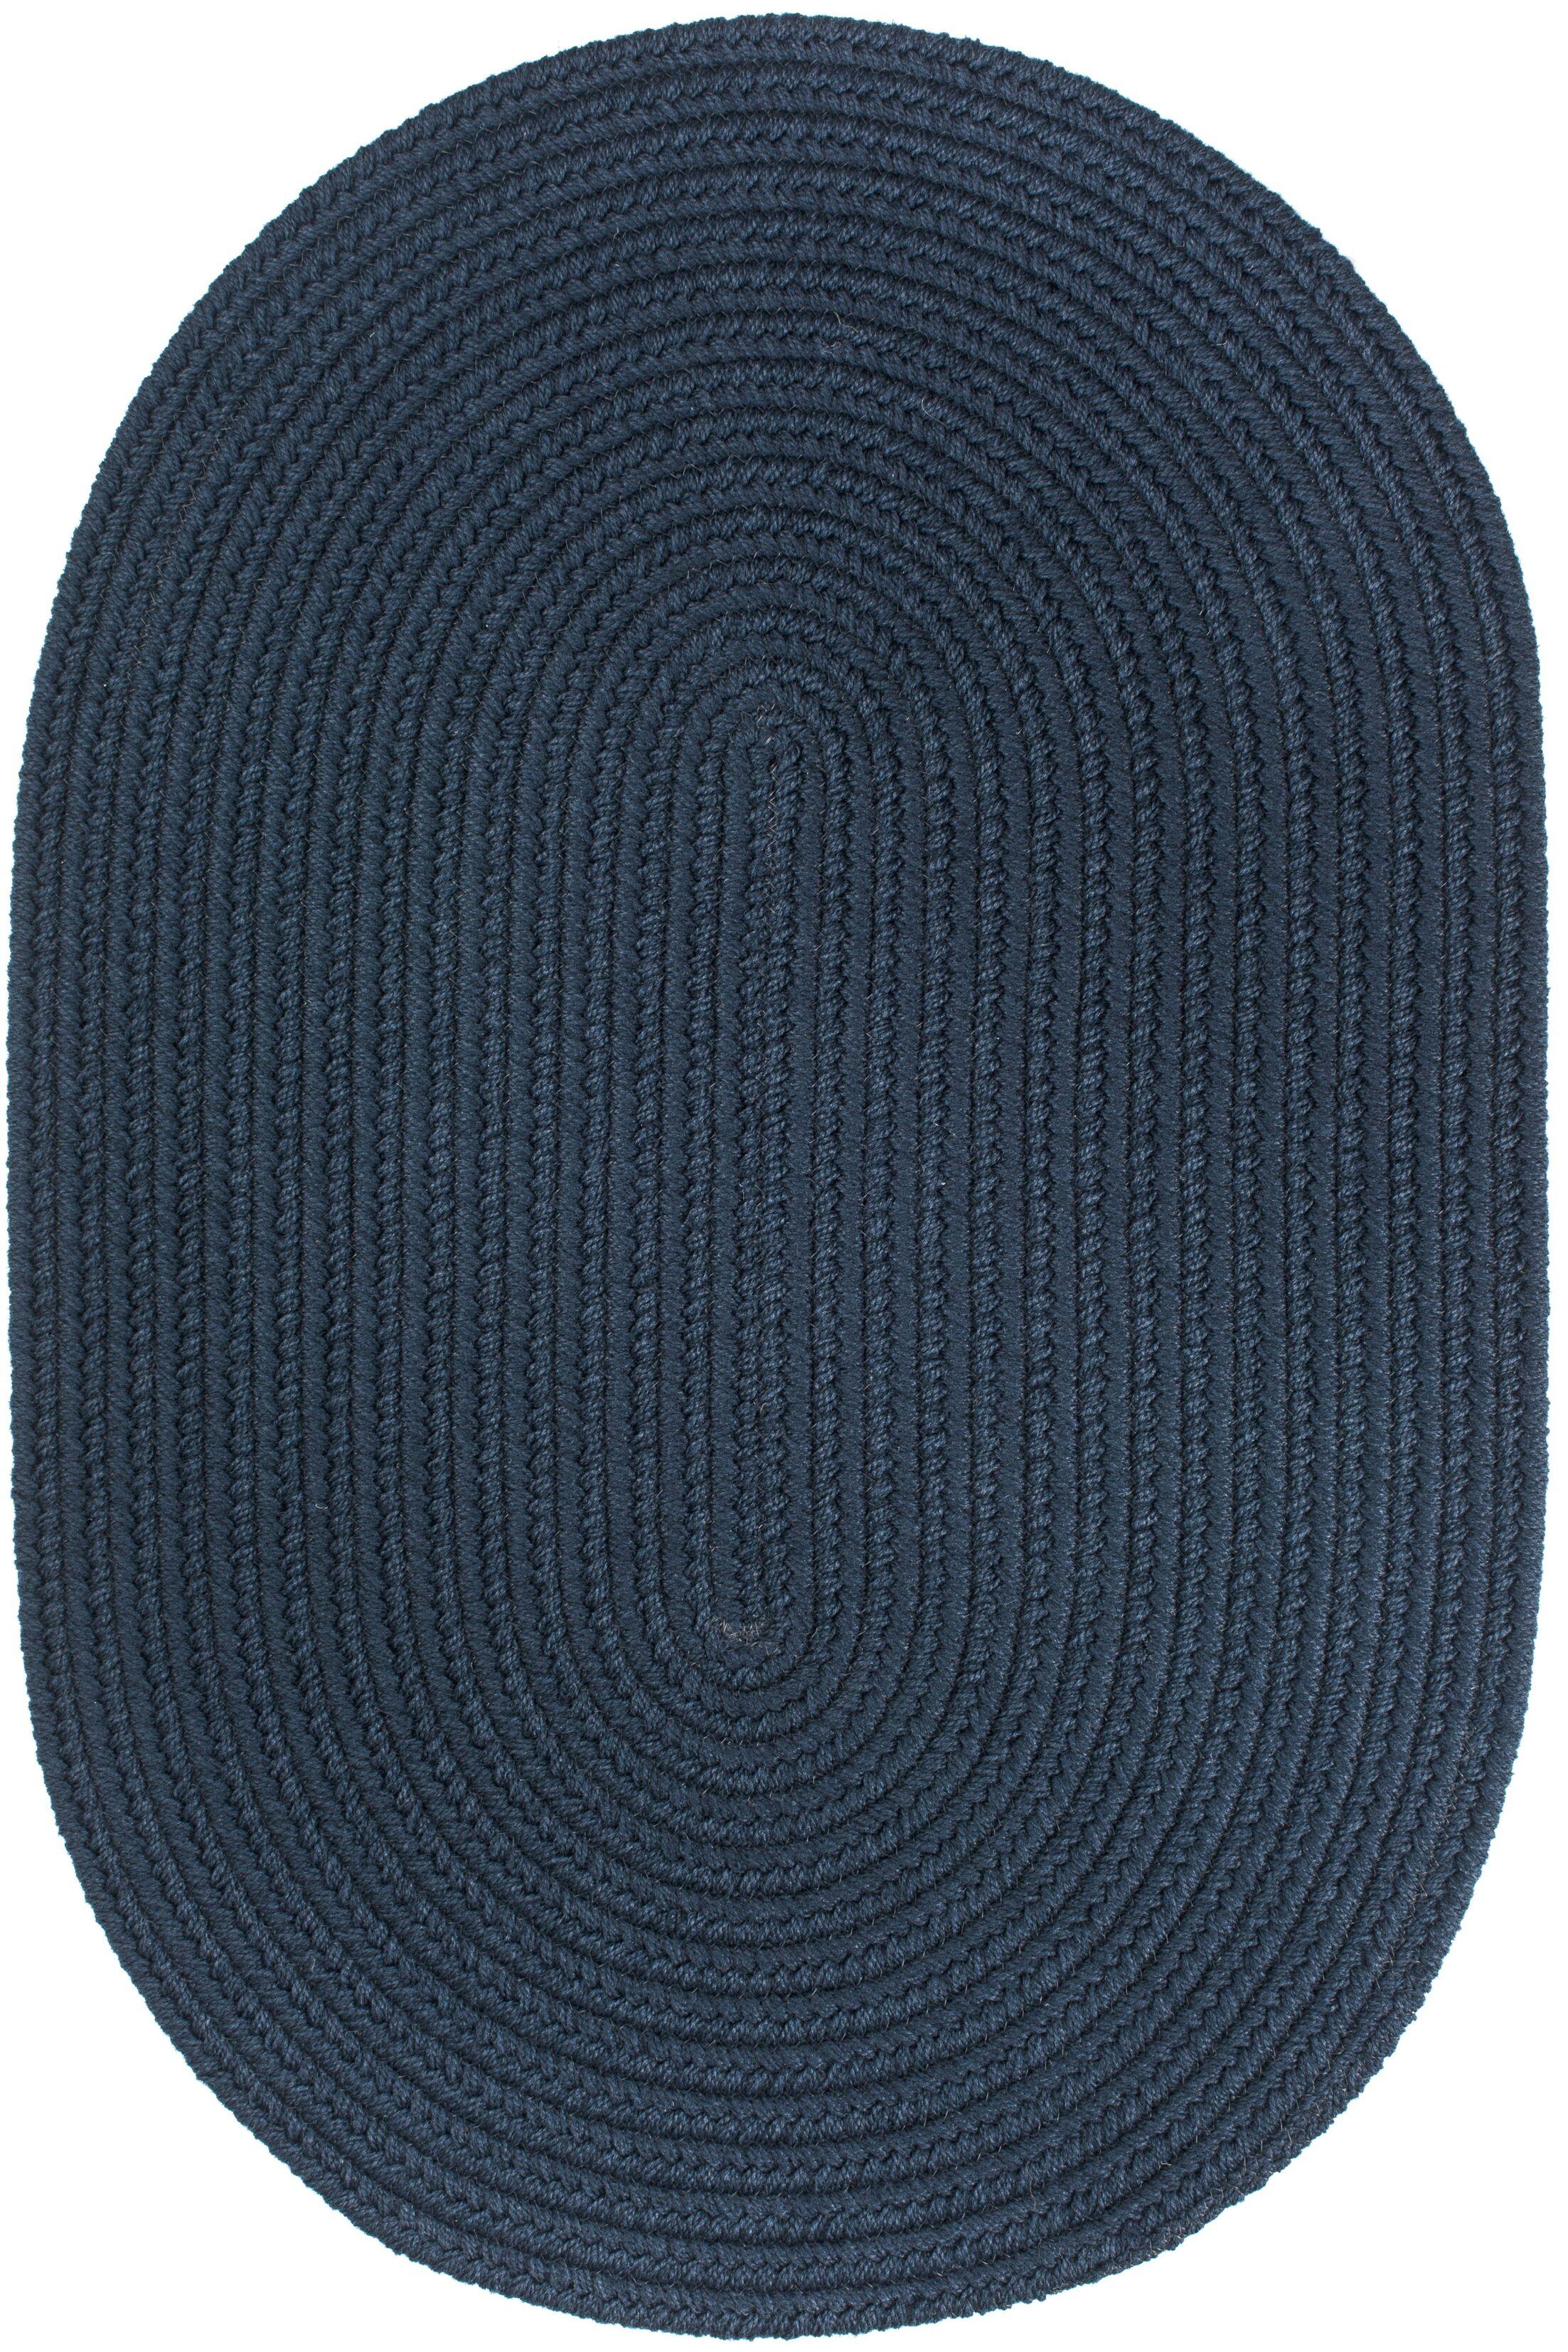 Handmade Navy Indoor/Outdoor Area Rug Rug Size: Oval  8' x 11'